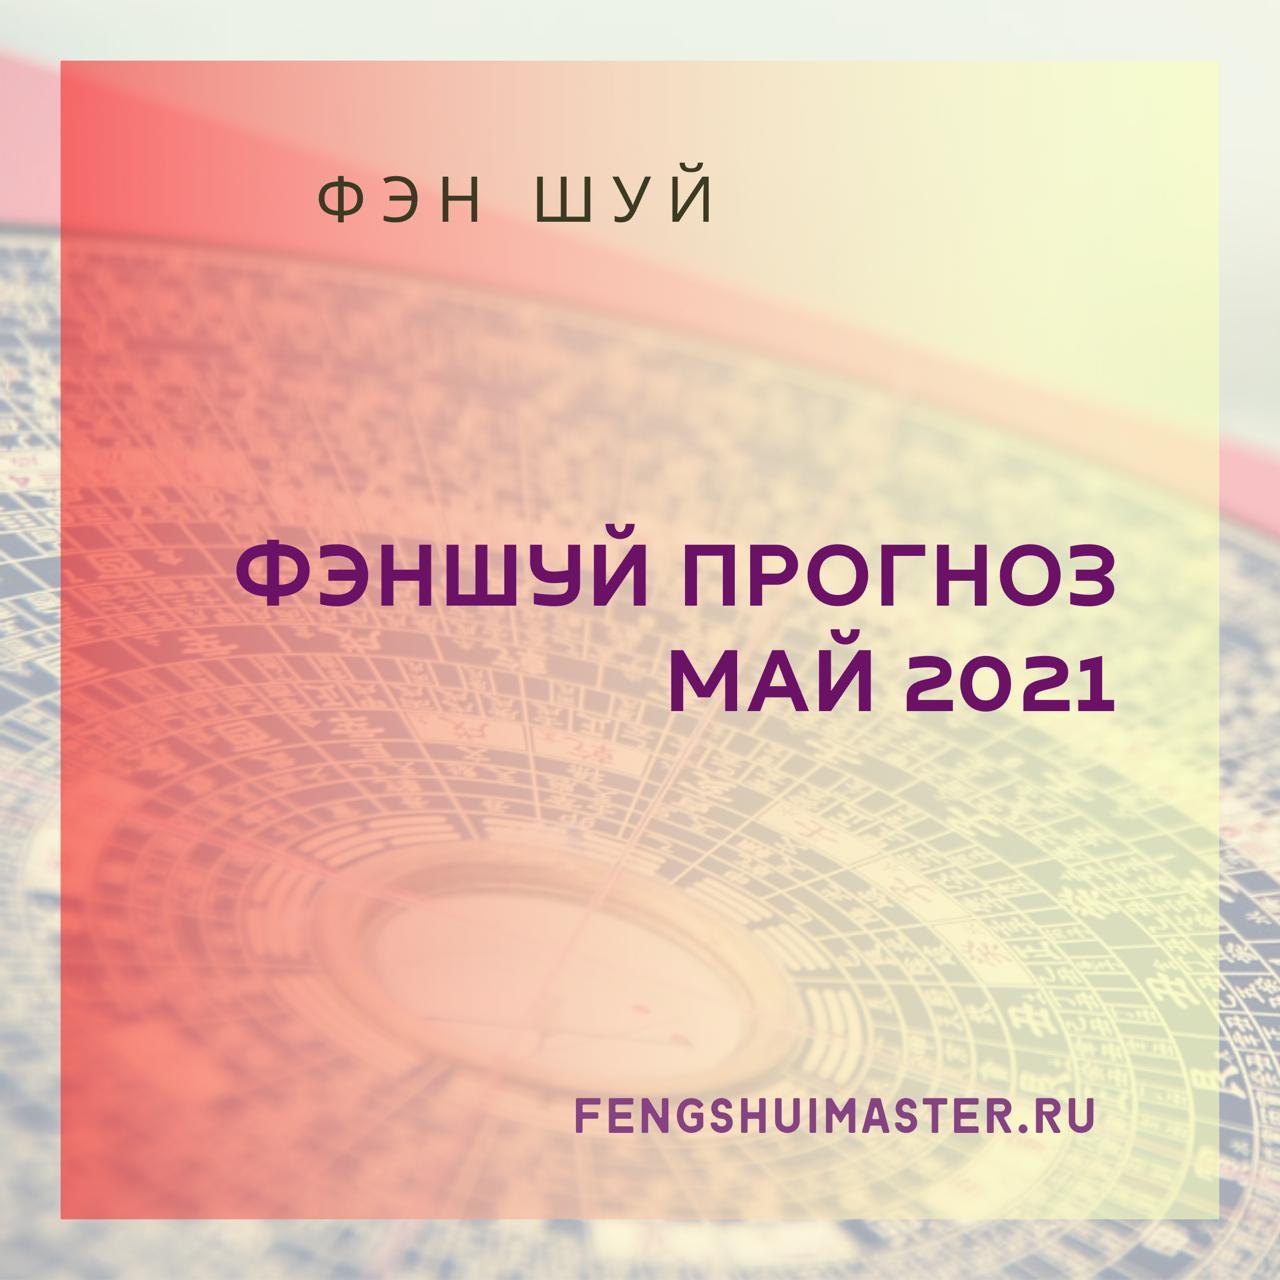 Фэншуй-прогноз май 2021 - Fengshuimaster.ru